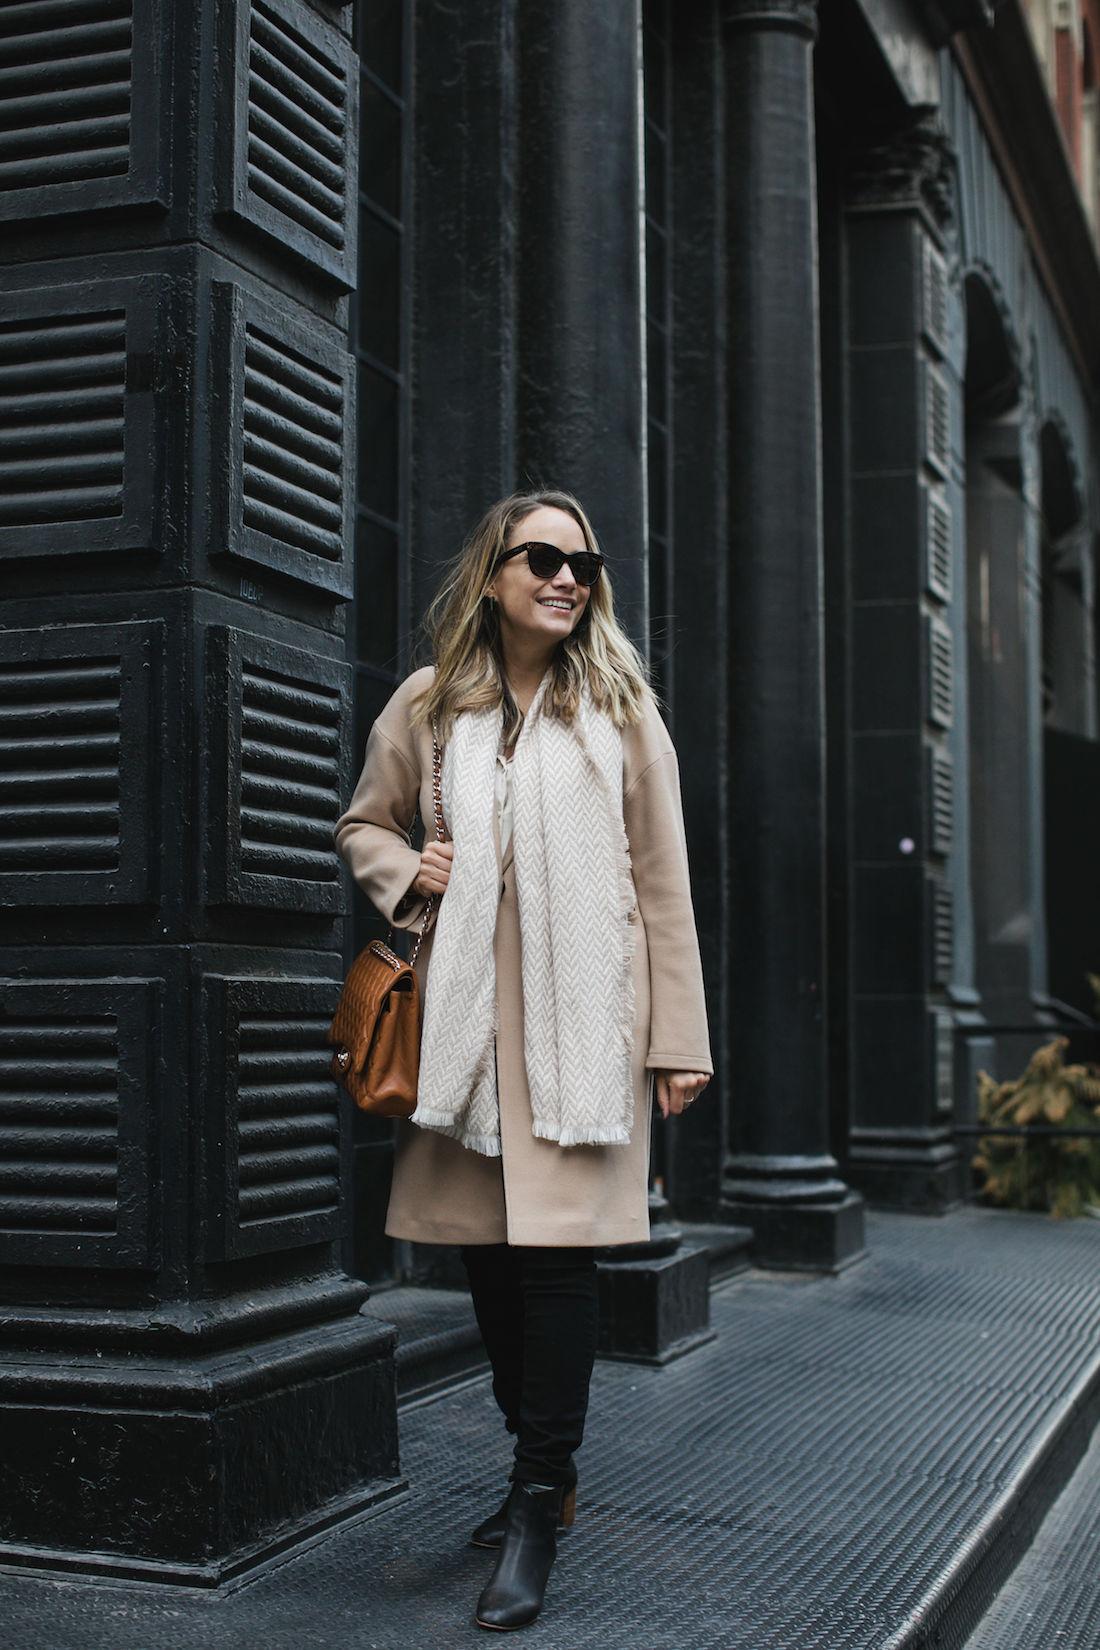 Outfit Details:Topshop Coat // Target Scarf // Topshop Satin PJ Shirt // Paige Jeans // Chanel Tan Maxi Bag // Soludos Boots